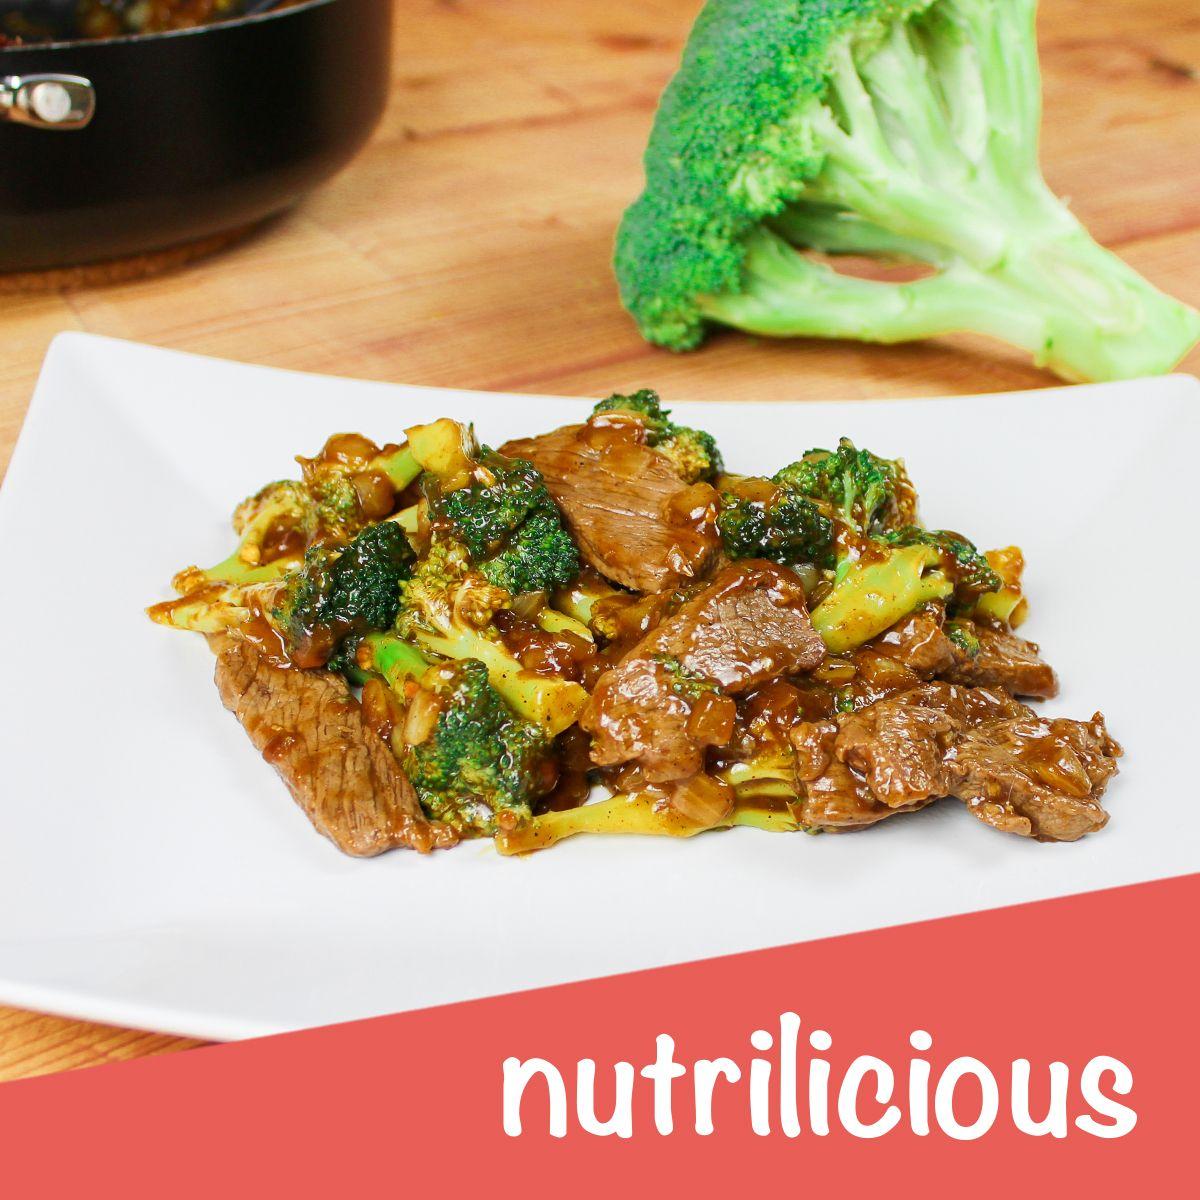 Brokkoli-Pfanne Mit Steak